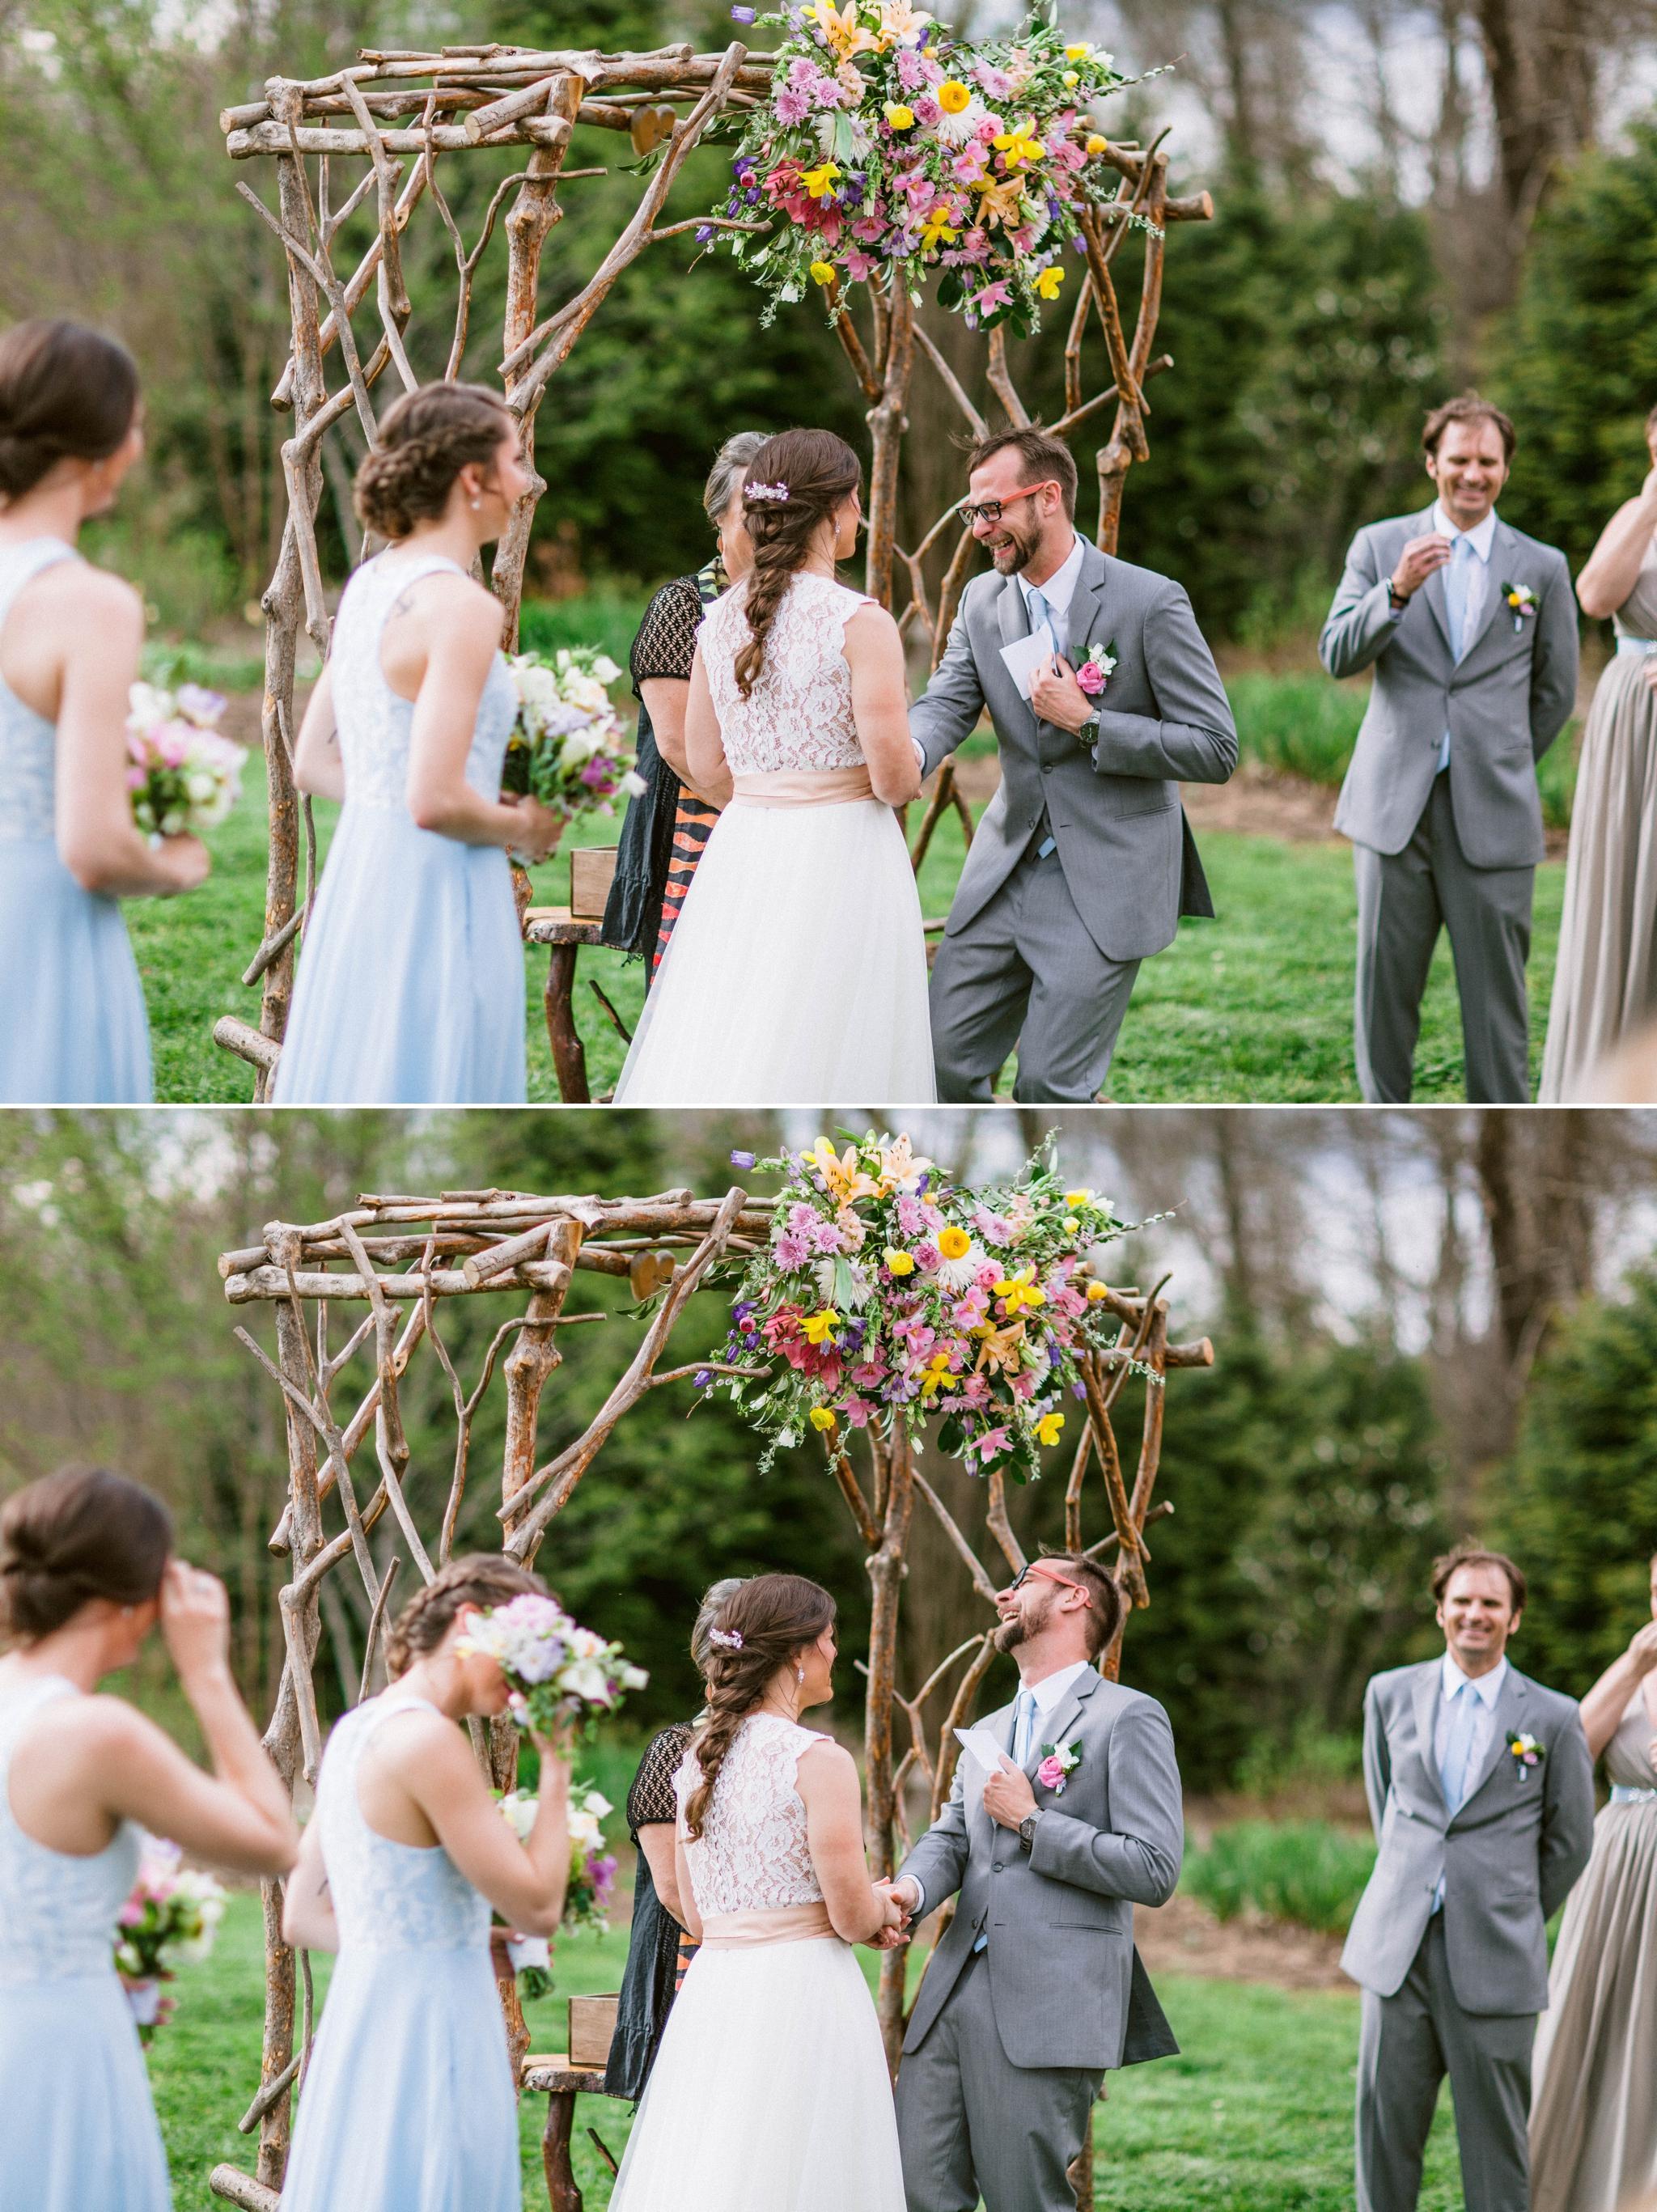 groom laughing during the ceremony - Honolulu Oahu Hawaii Wedding Photographer